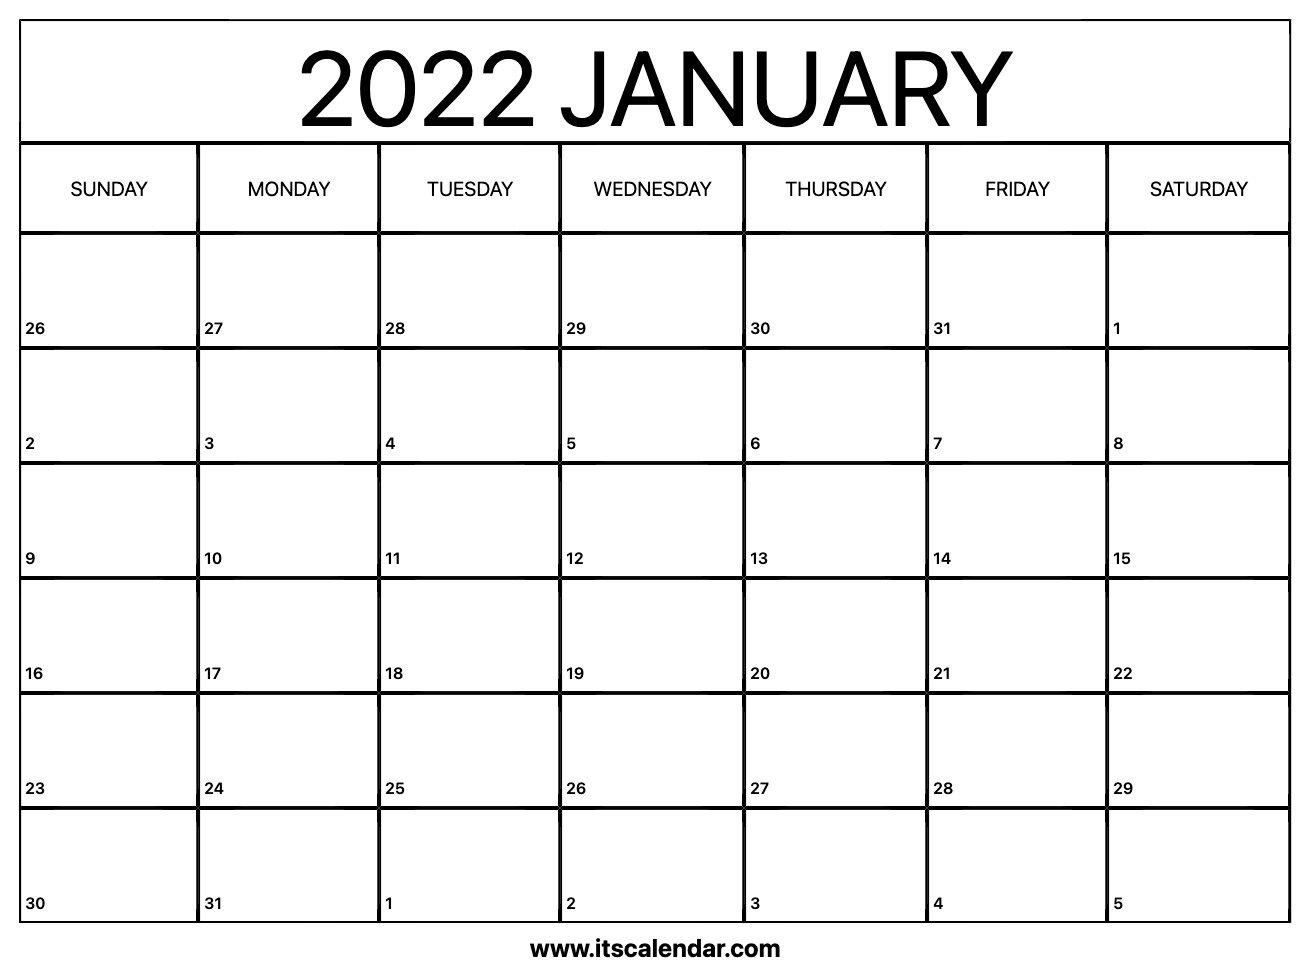 Free Printable January 2022 Calendar within Planner 2022 Printable Goal